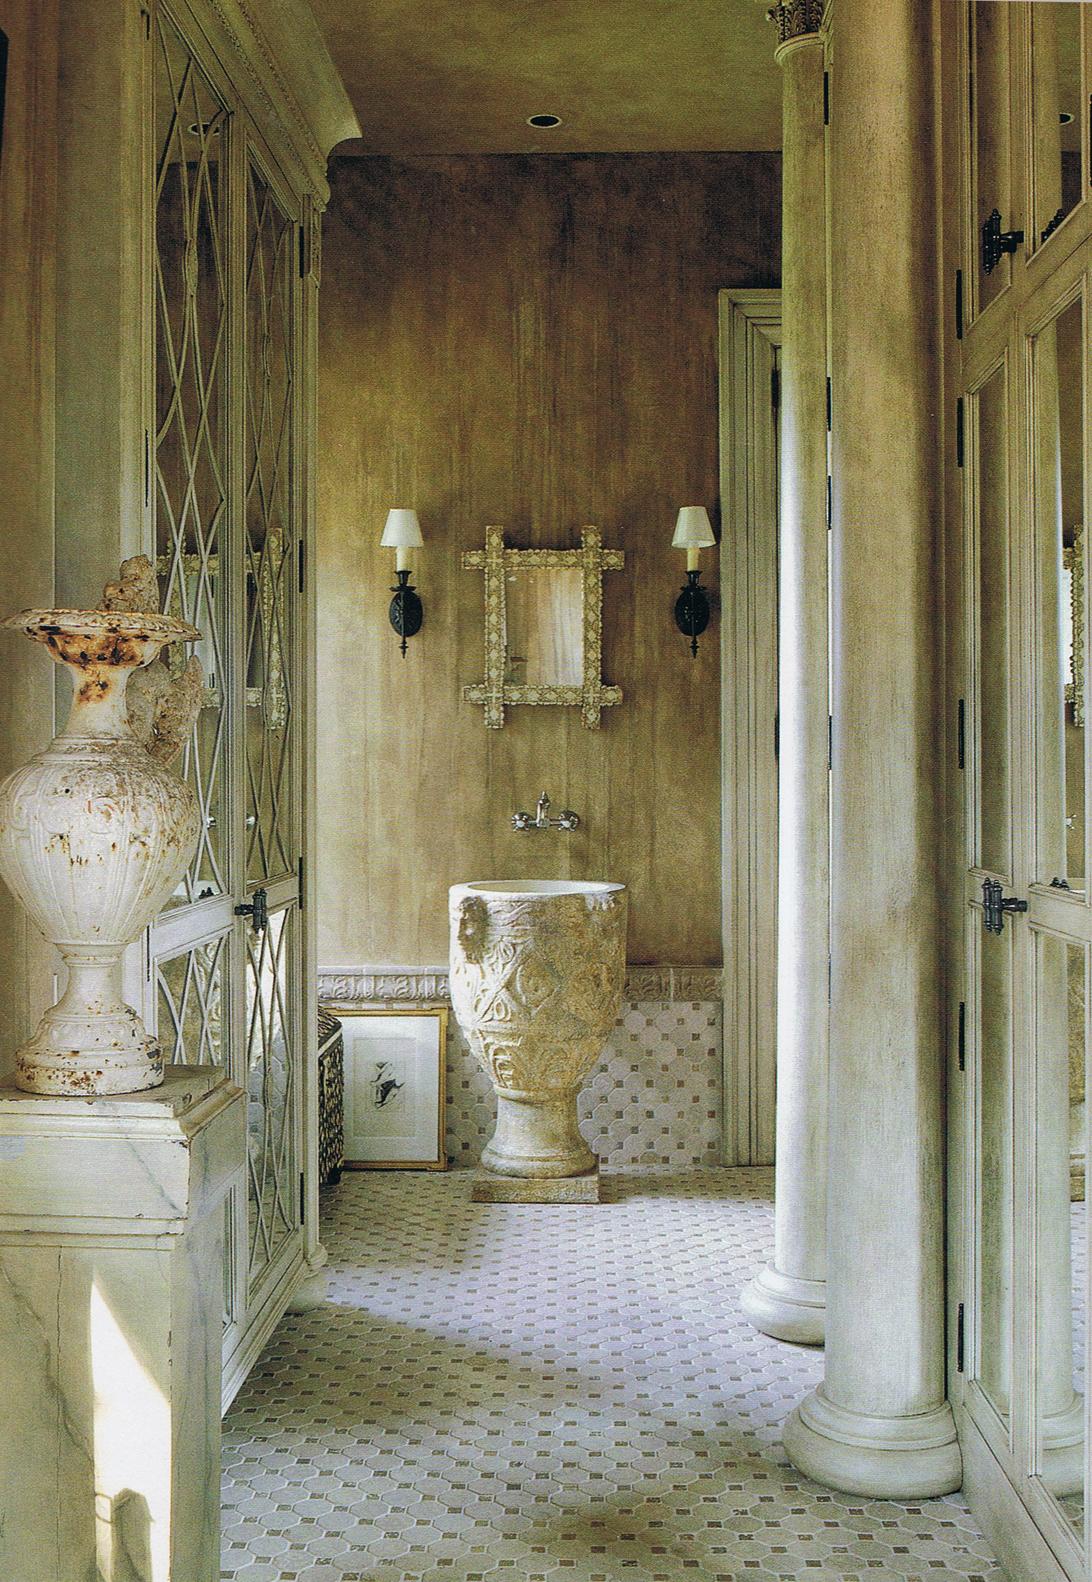 barry dixon beautiful baths bhg 06 - Barry Dixon Interiors